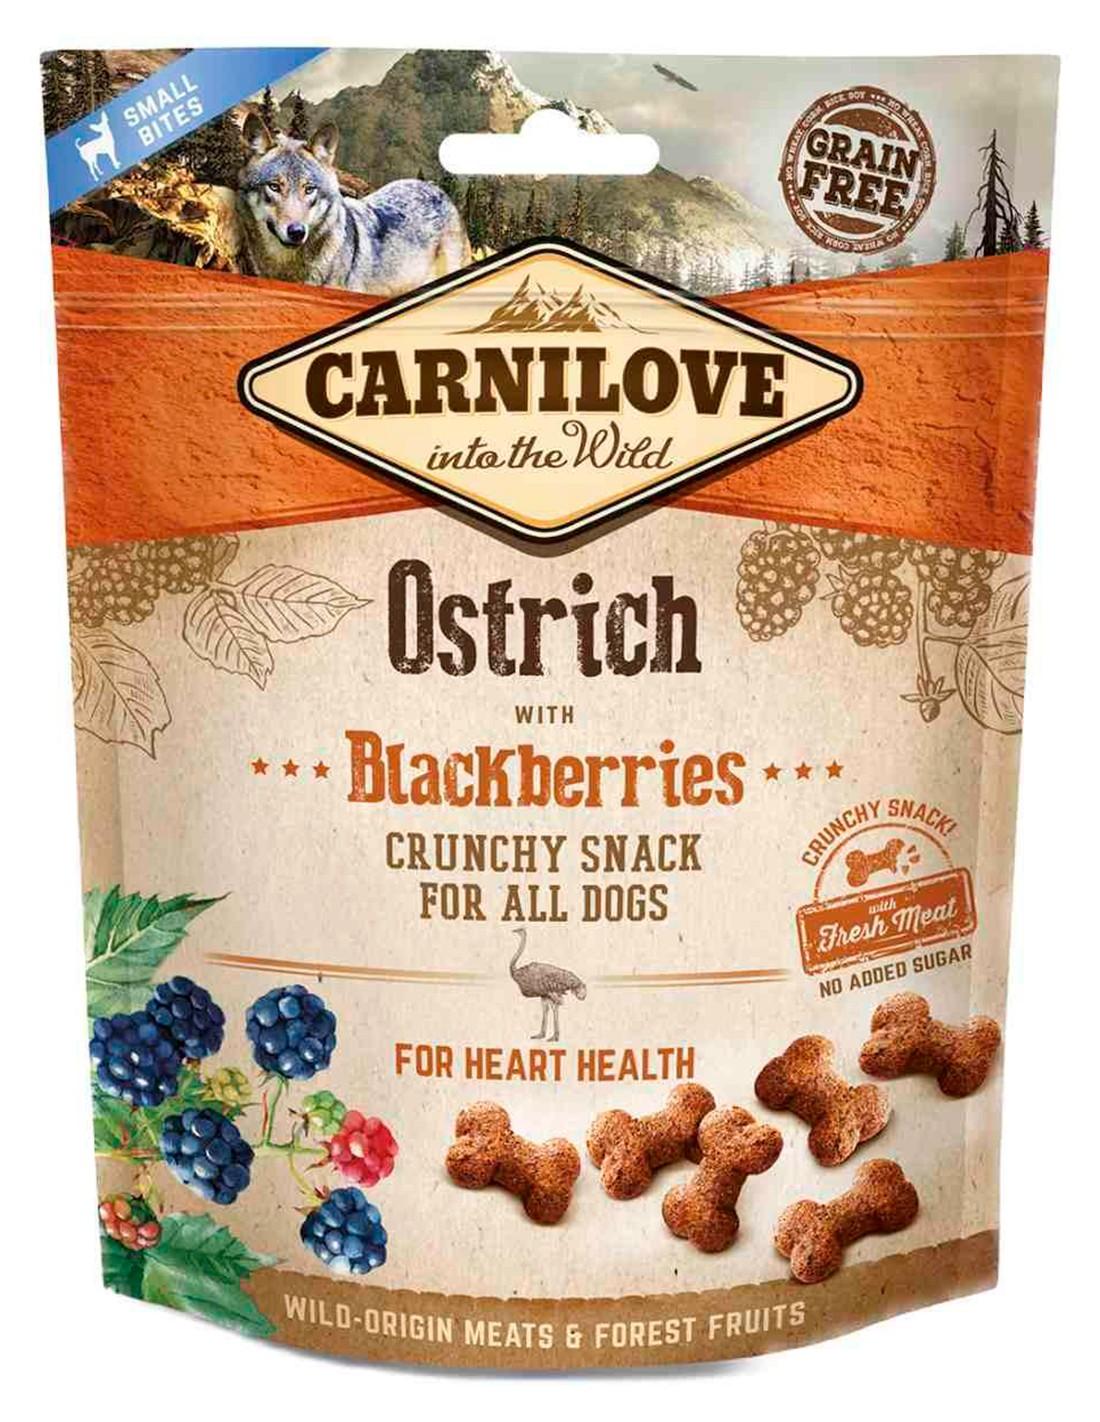 Carnilove Avestruz con moras 200g - Snack Crunchy